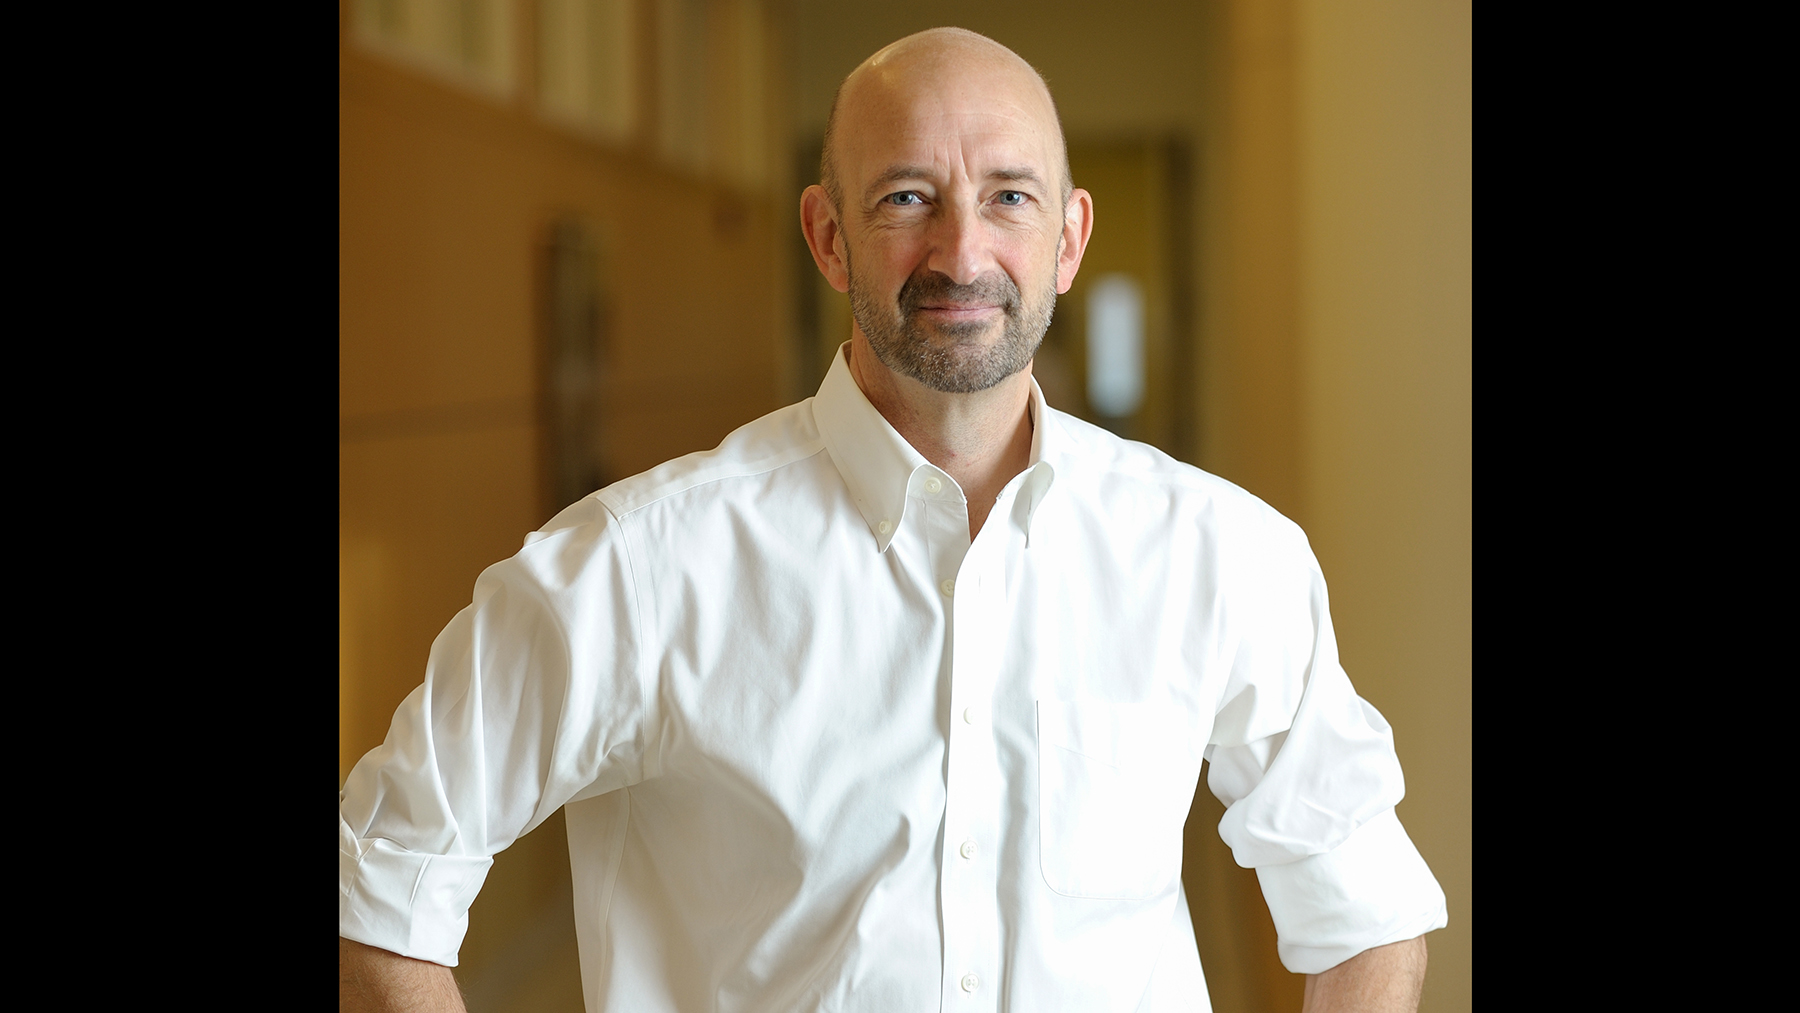 Professor Timothy Johnson